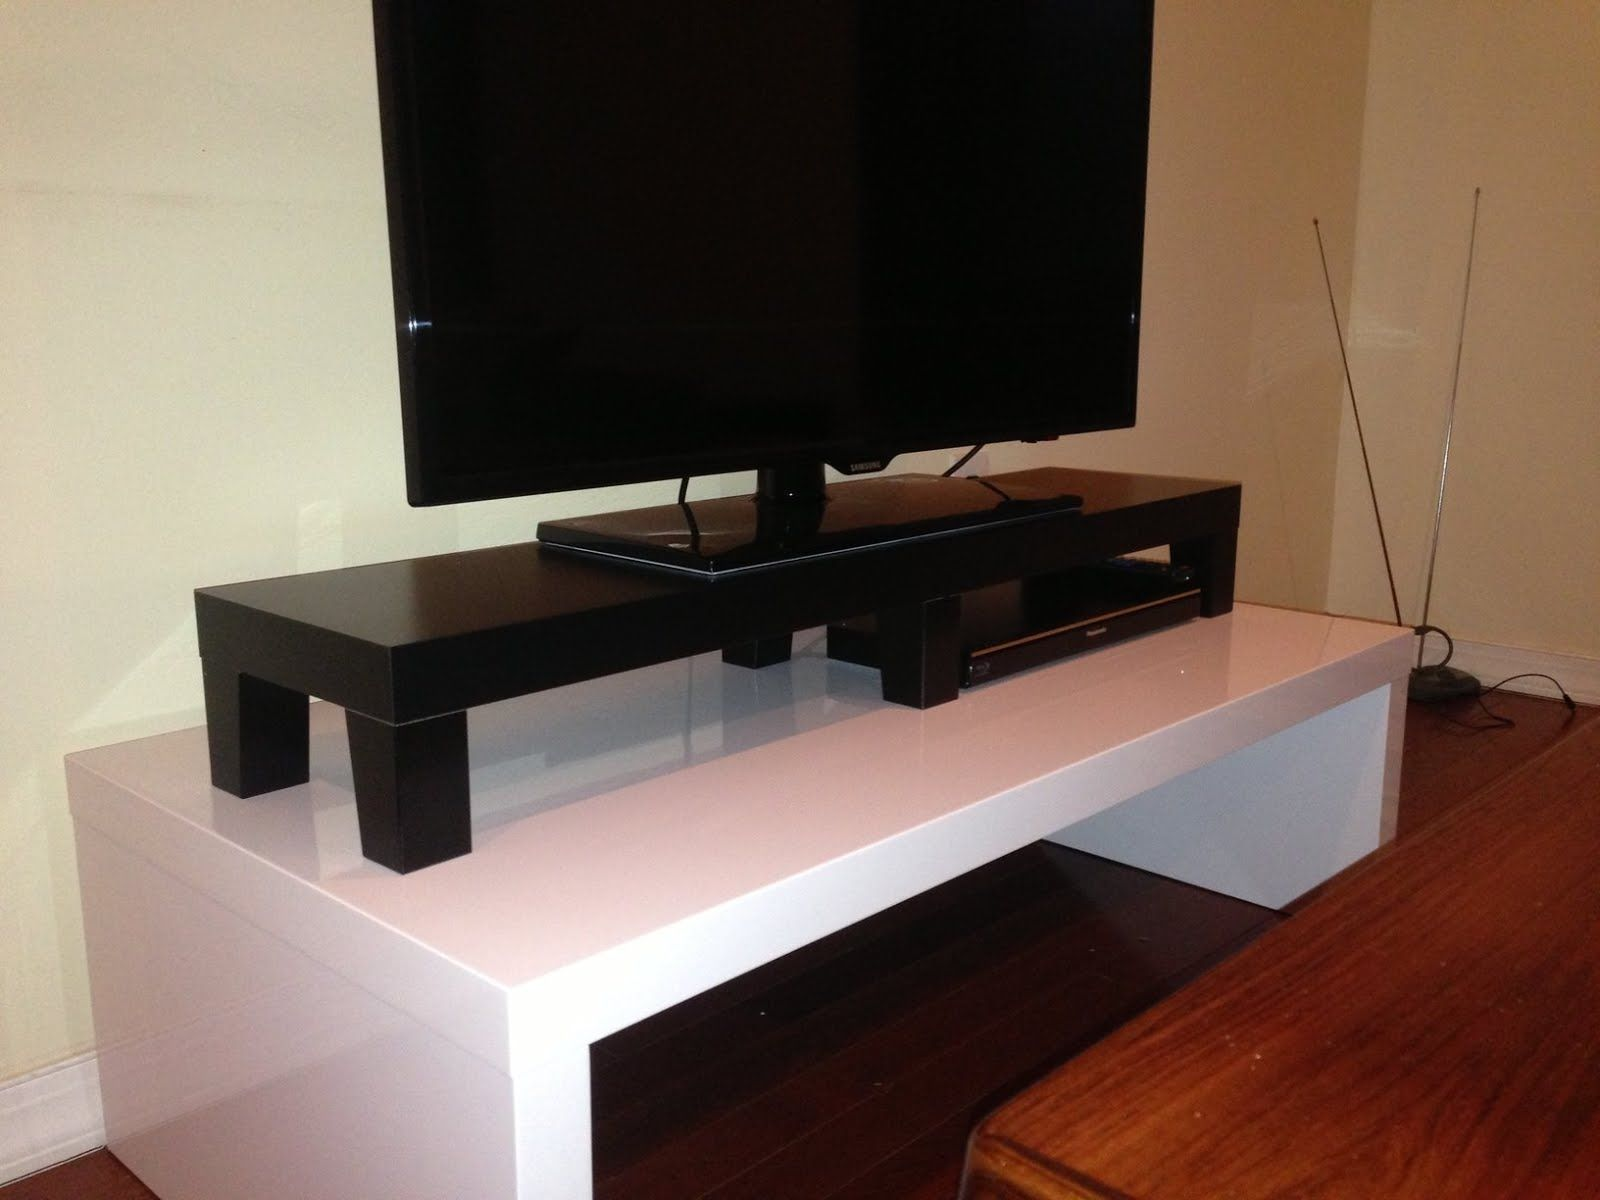 Lack Tv Unit Again Coffee Table Ikea Hackers Ikea Lack Coffee Table Tv Stand And Coffee Table Lack Coffee Table [ 1200 x 1600 Pixel ]